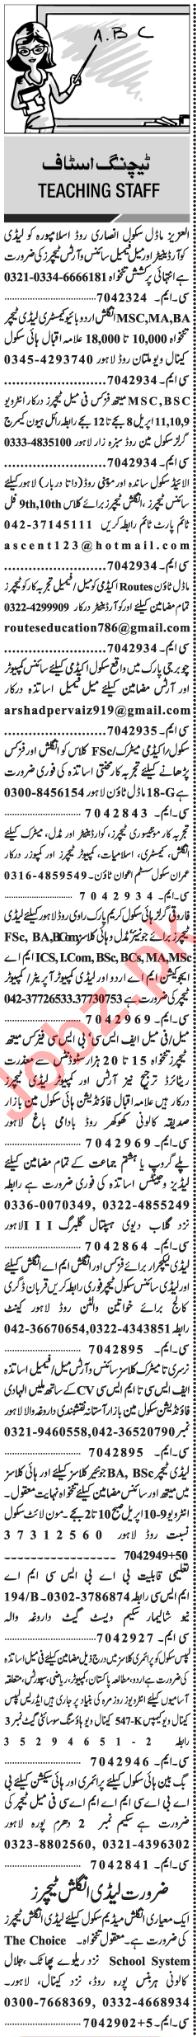 Principal & Teachers Jobs in Lahore